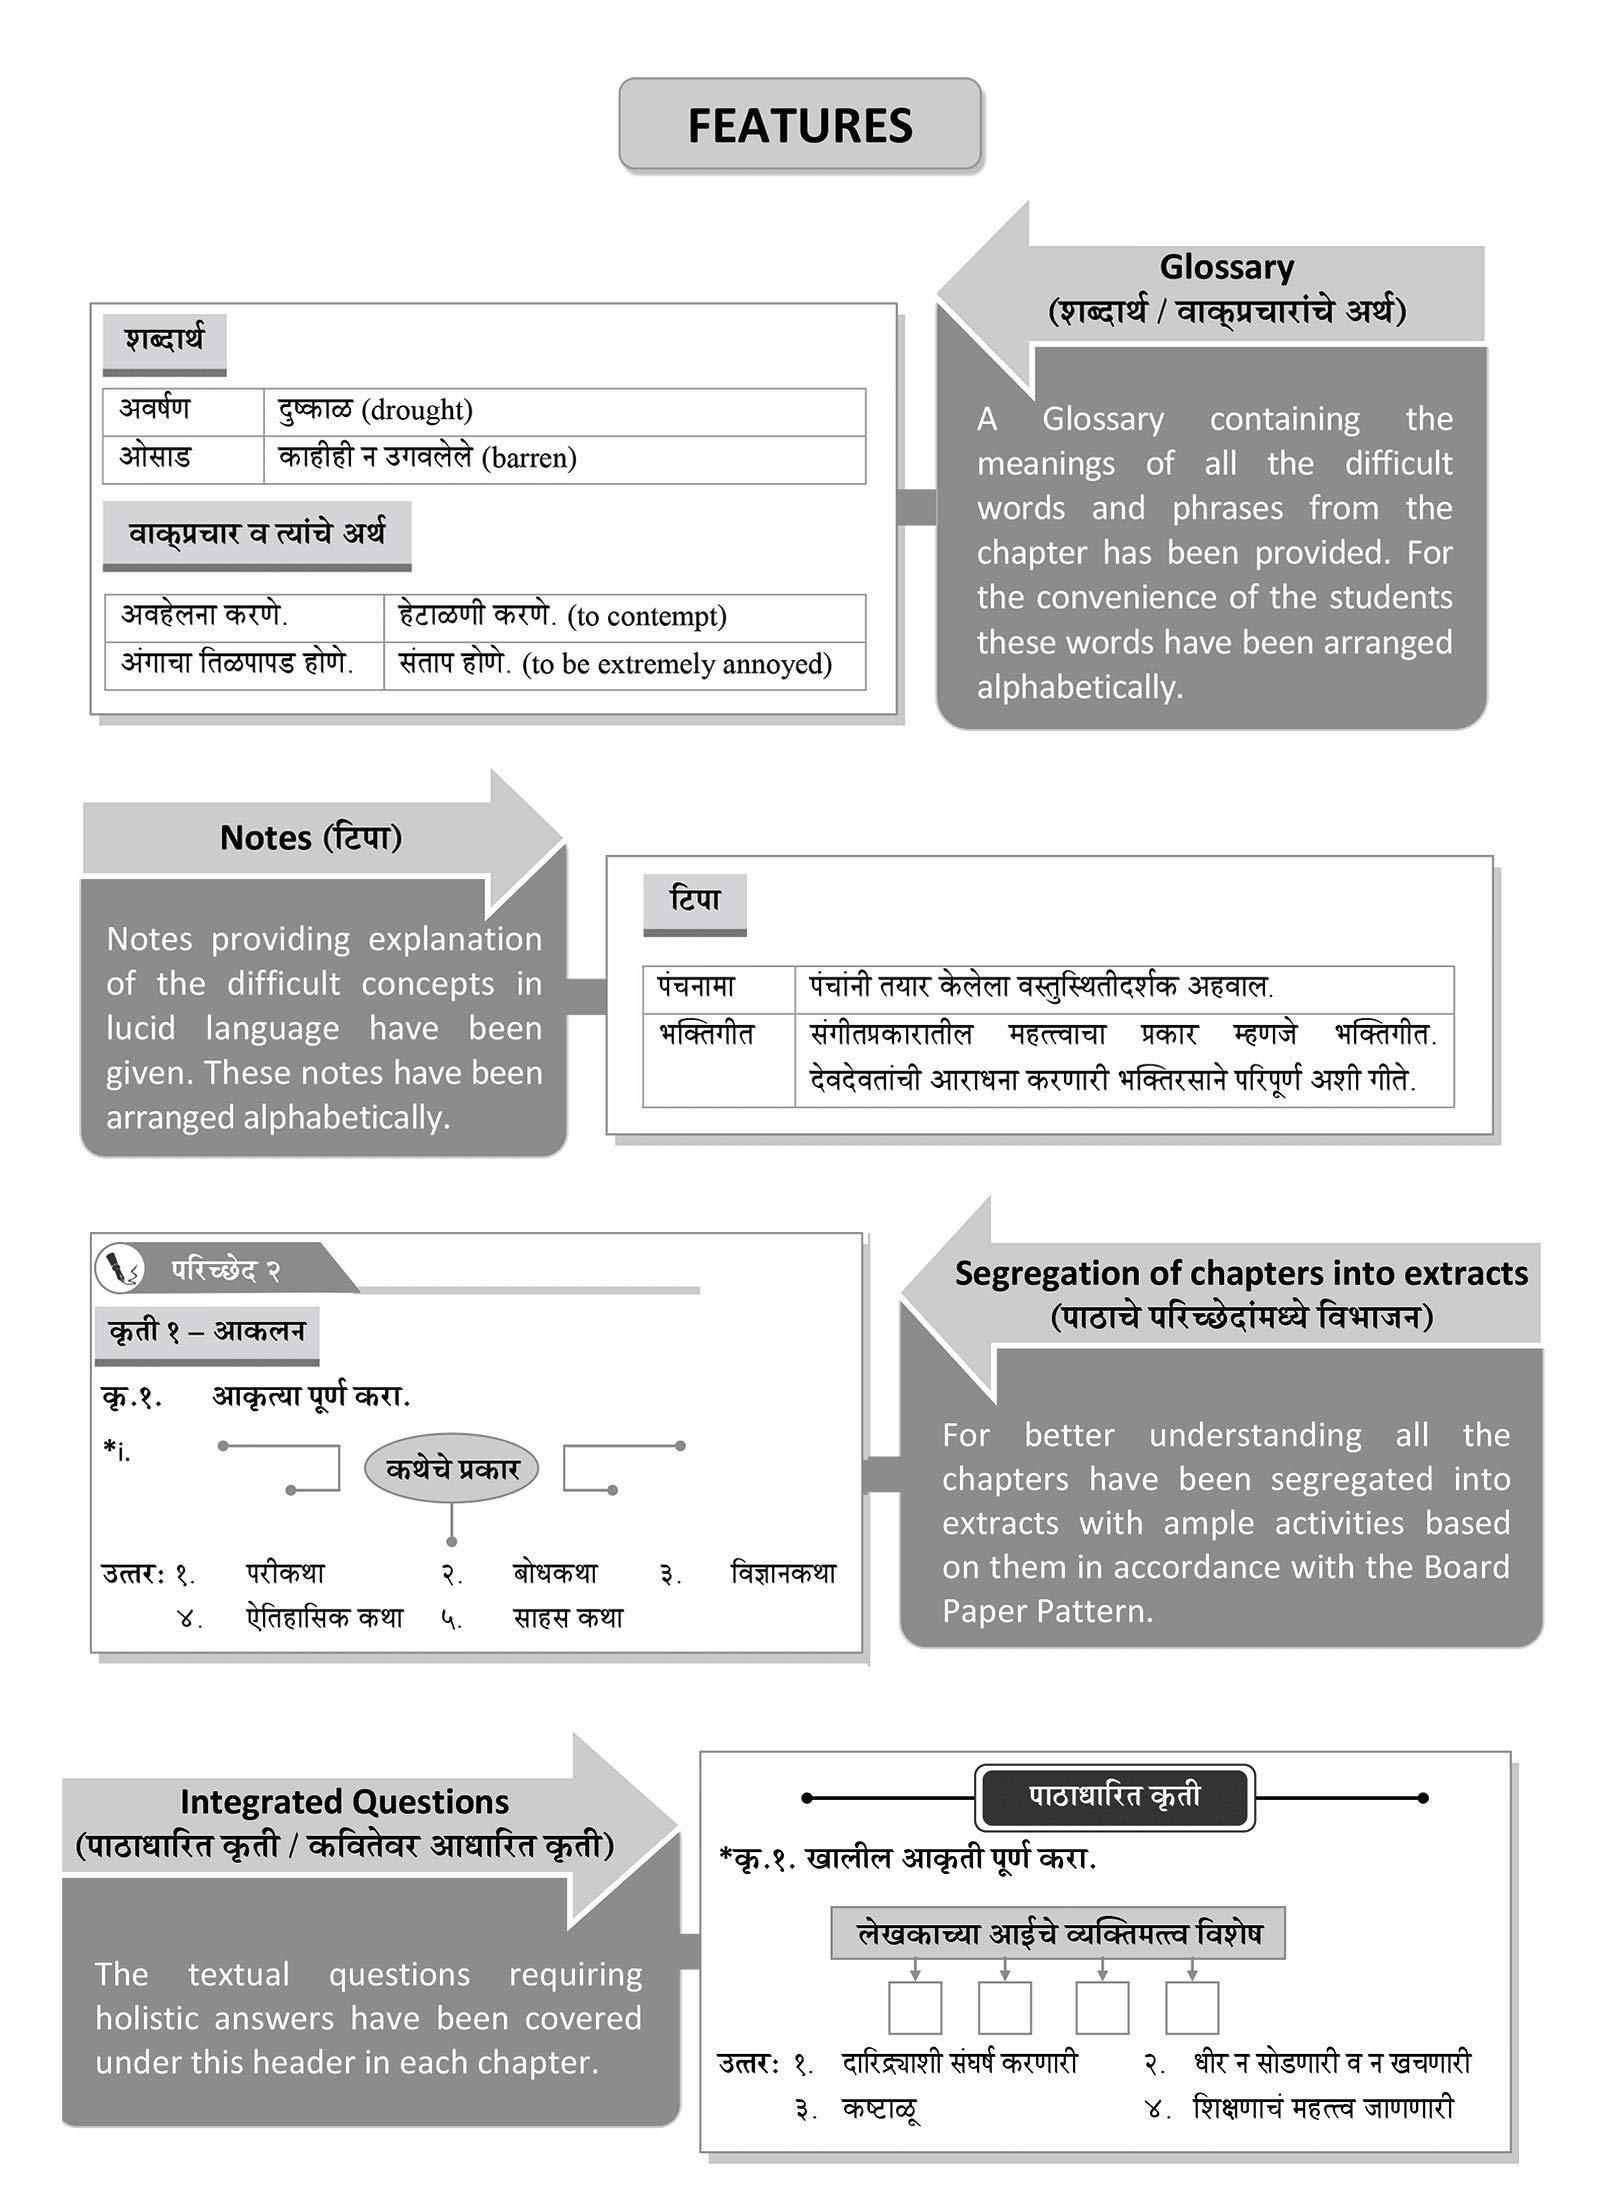 Std 10 Precise Notes Marathi Aksharbharati Book English Medium Ssc Maharashtra State Board Includes Grammar Vocabulary And Writing Skills Based On 10th New Paper Pattern Amazon In Content Team